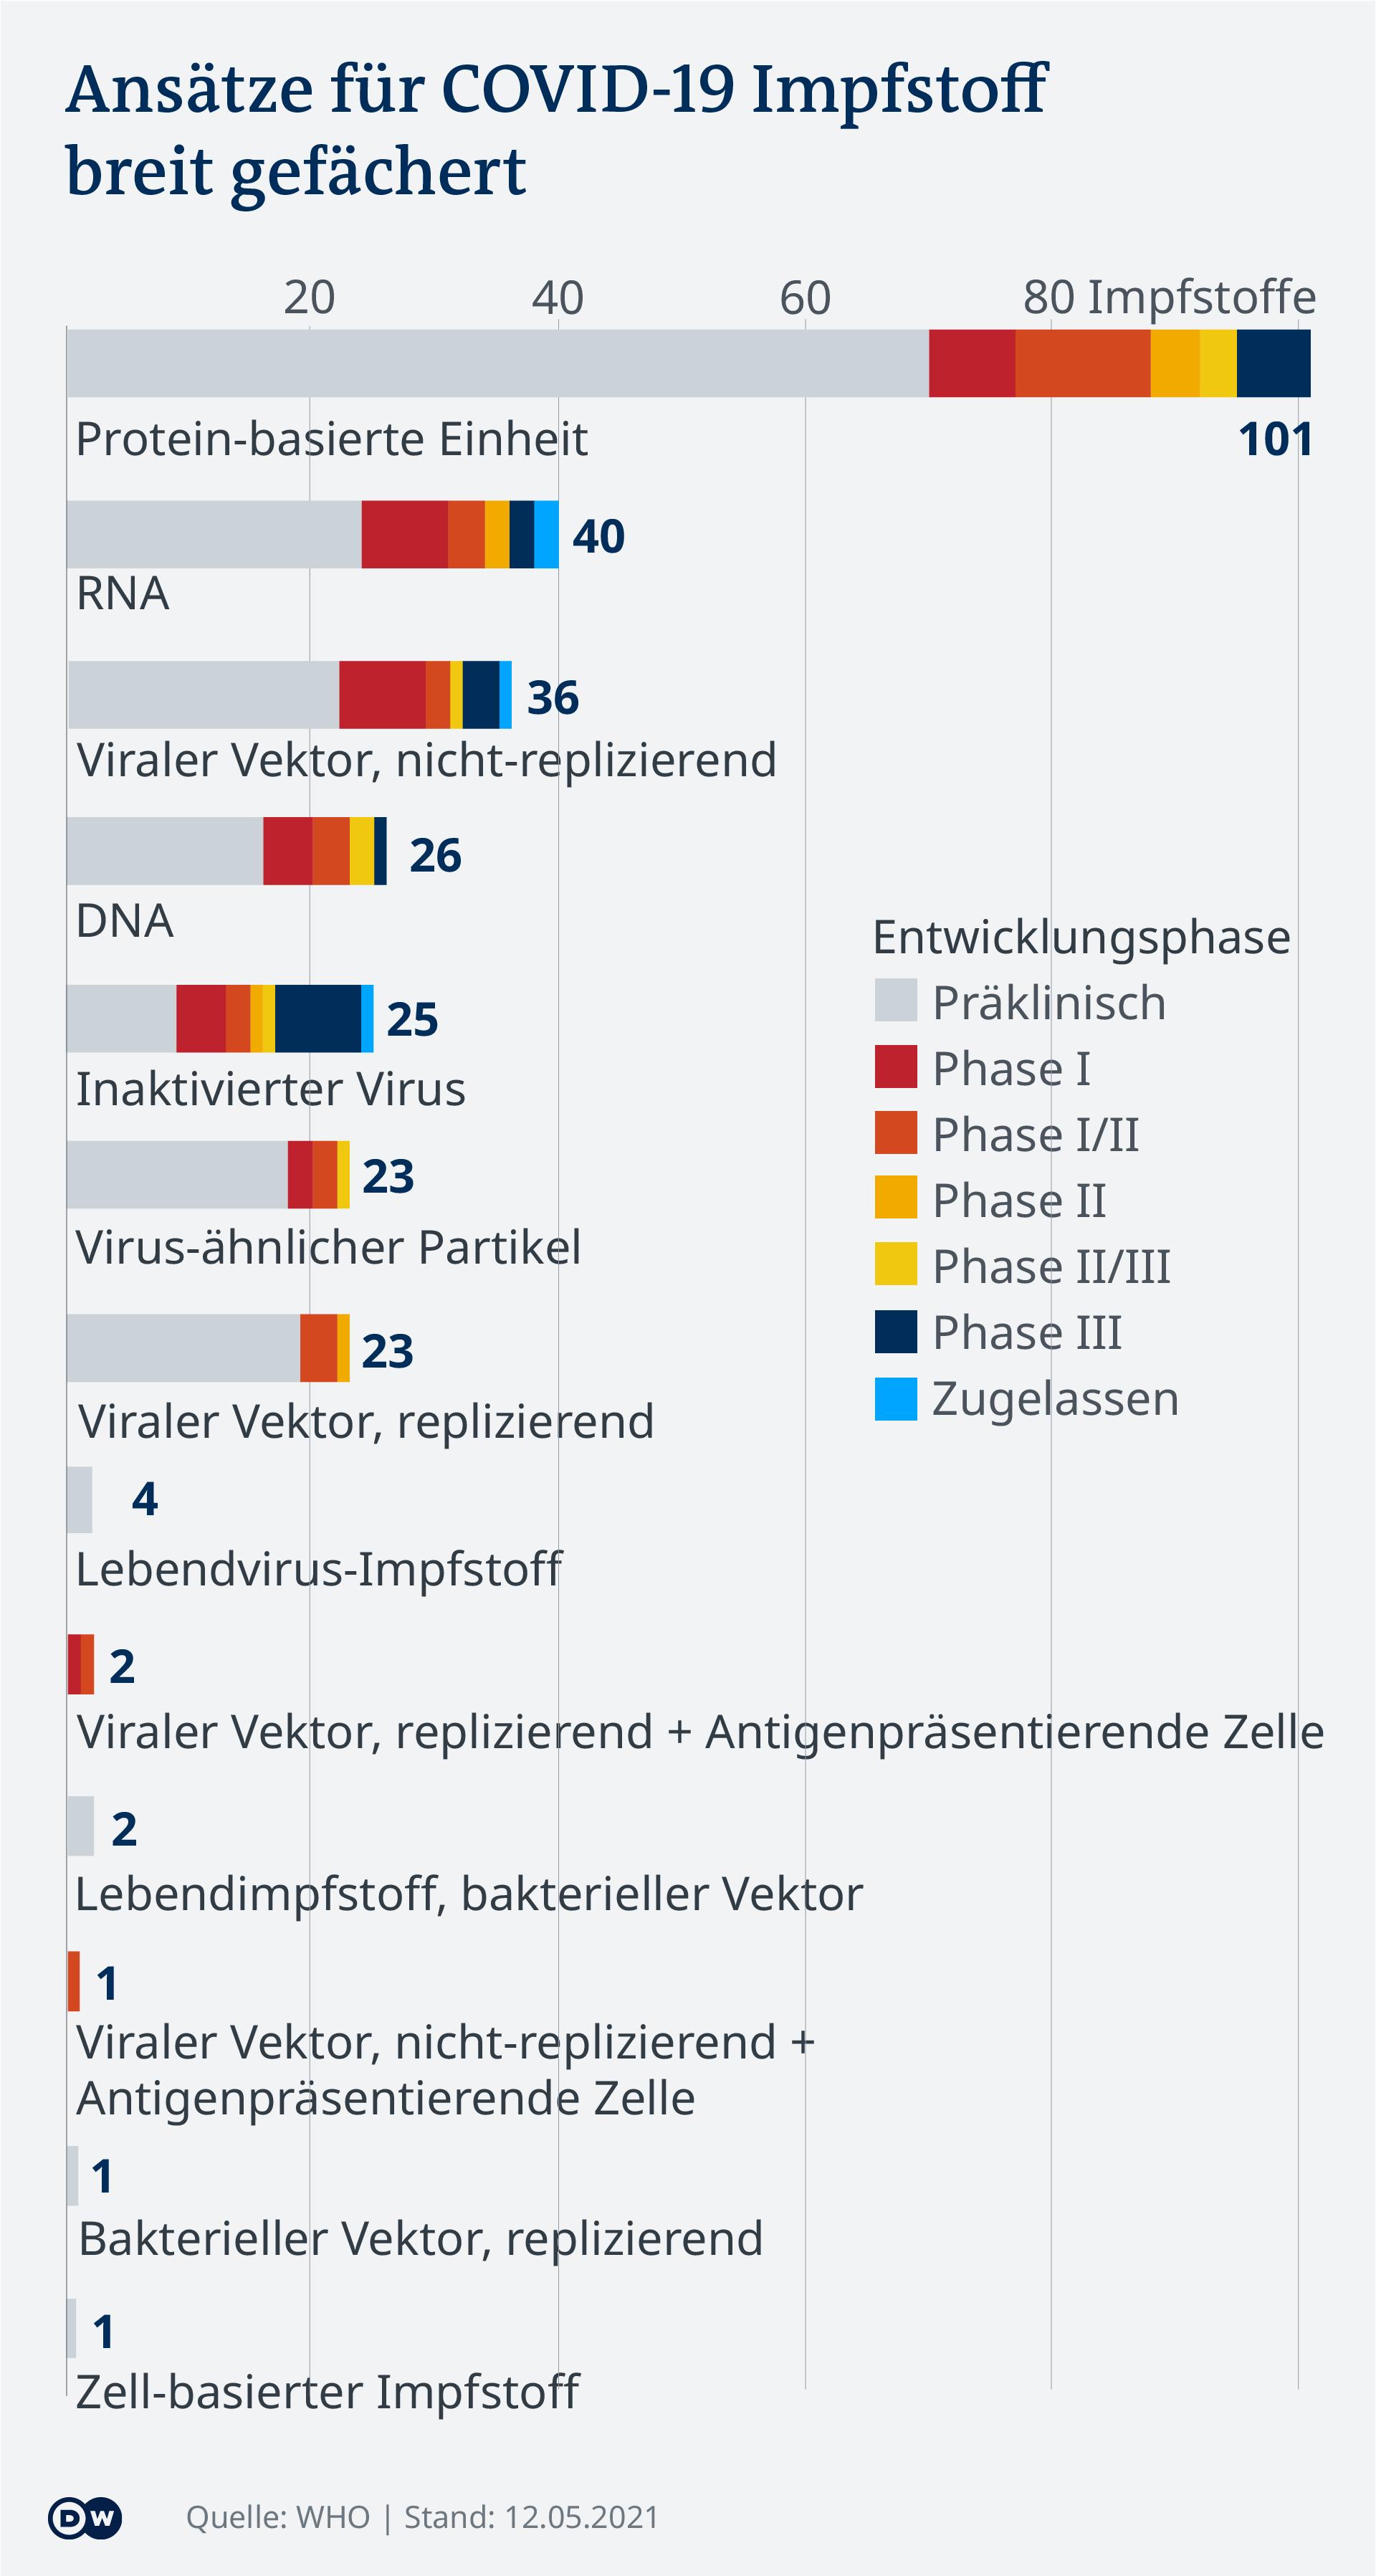 Data visualization - COVID-19 vaccine tracker - Types - Update May 12, 2021 - German